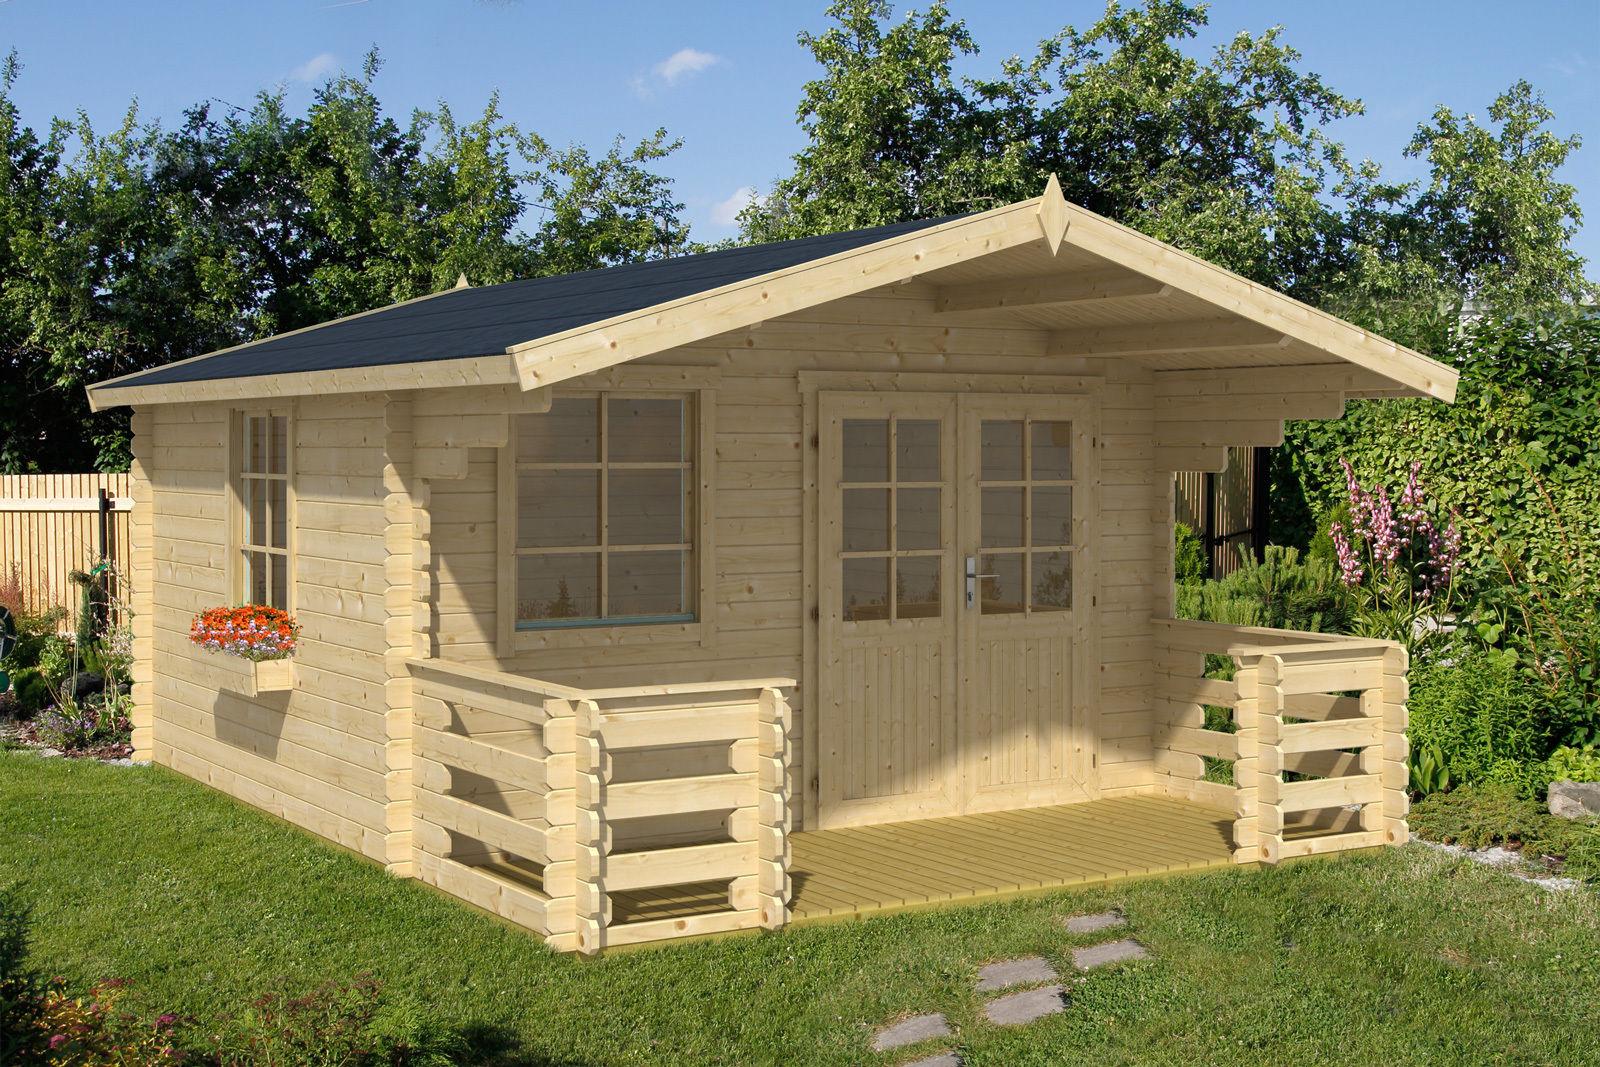 gartenhaus reno 3 28 mm ca 380x380 cm holzwurm obersayn. Black Bedroom Furniture Sets. Home Design Ideas